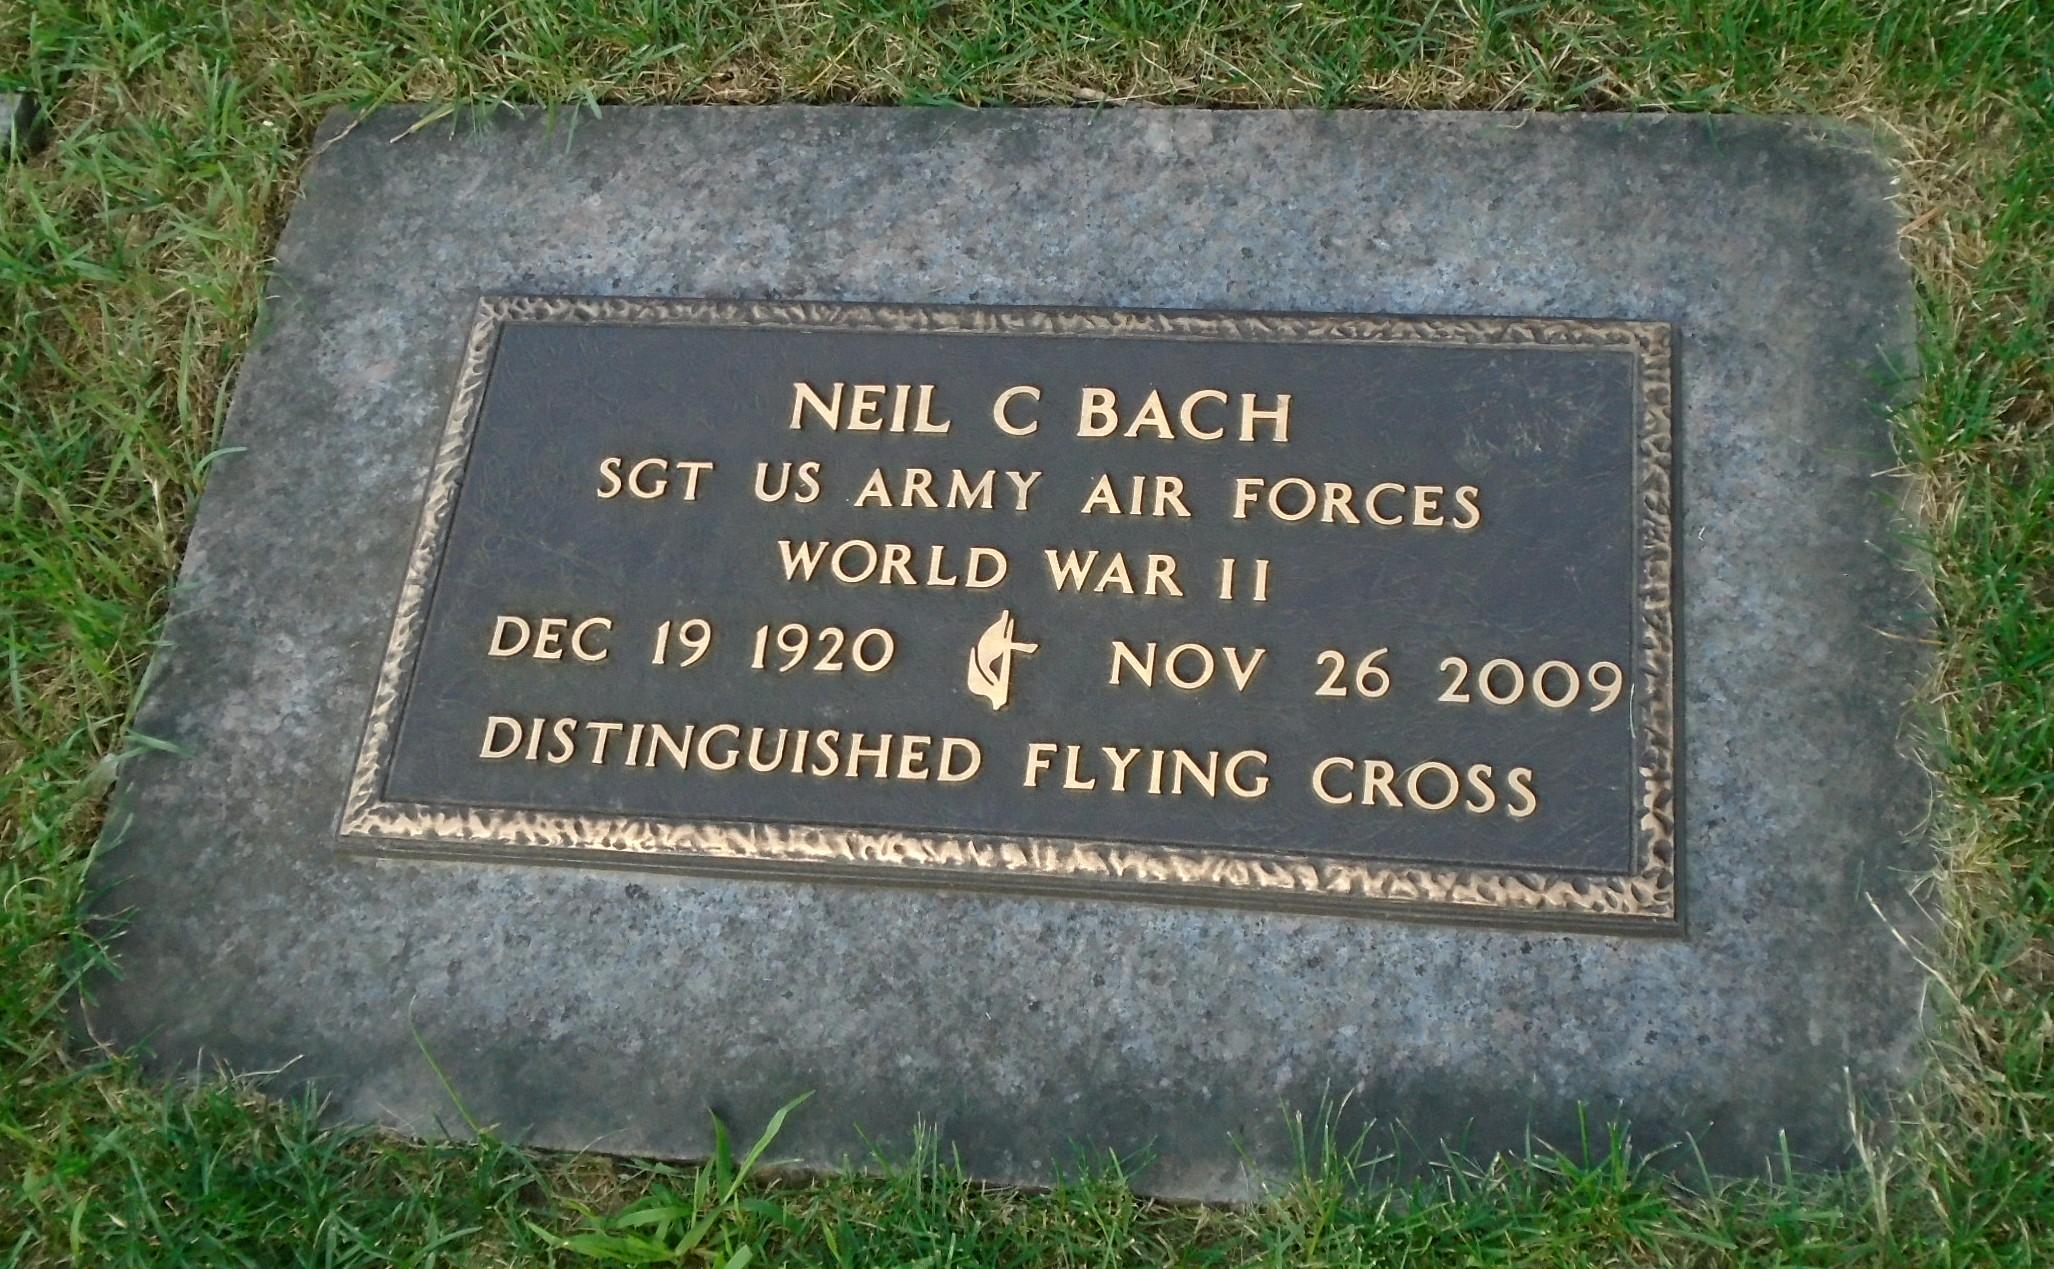 Neil C. Bach